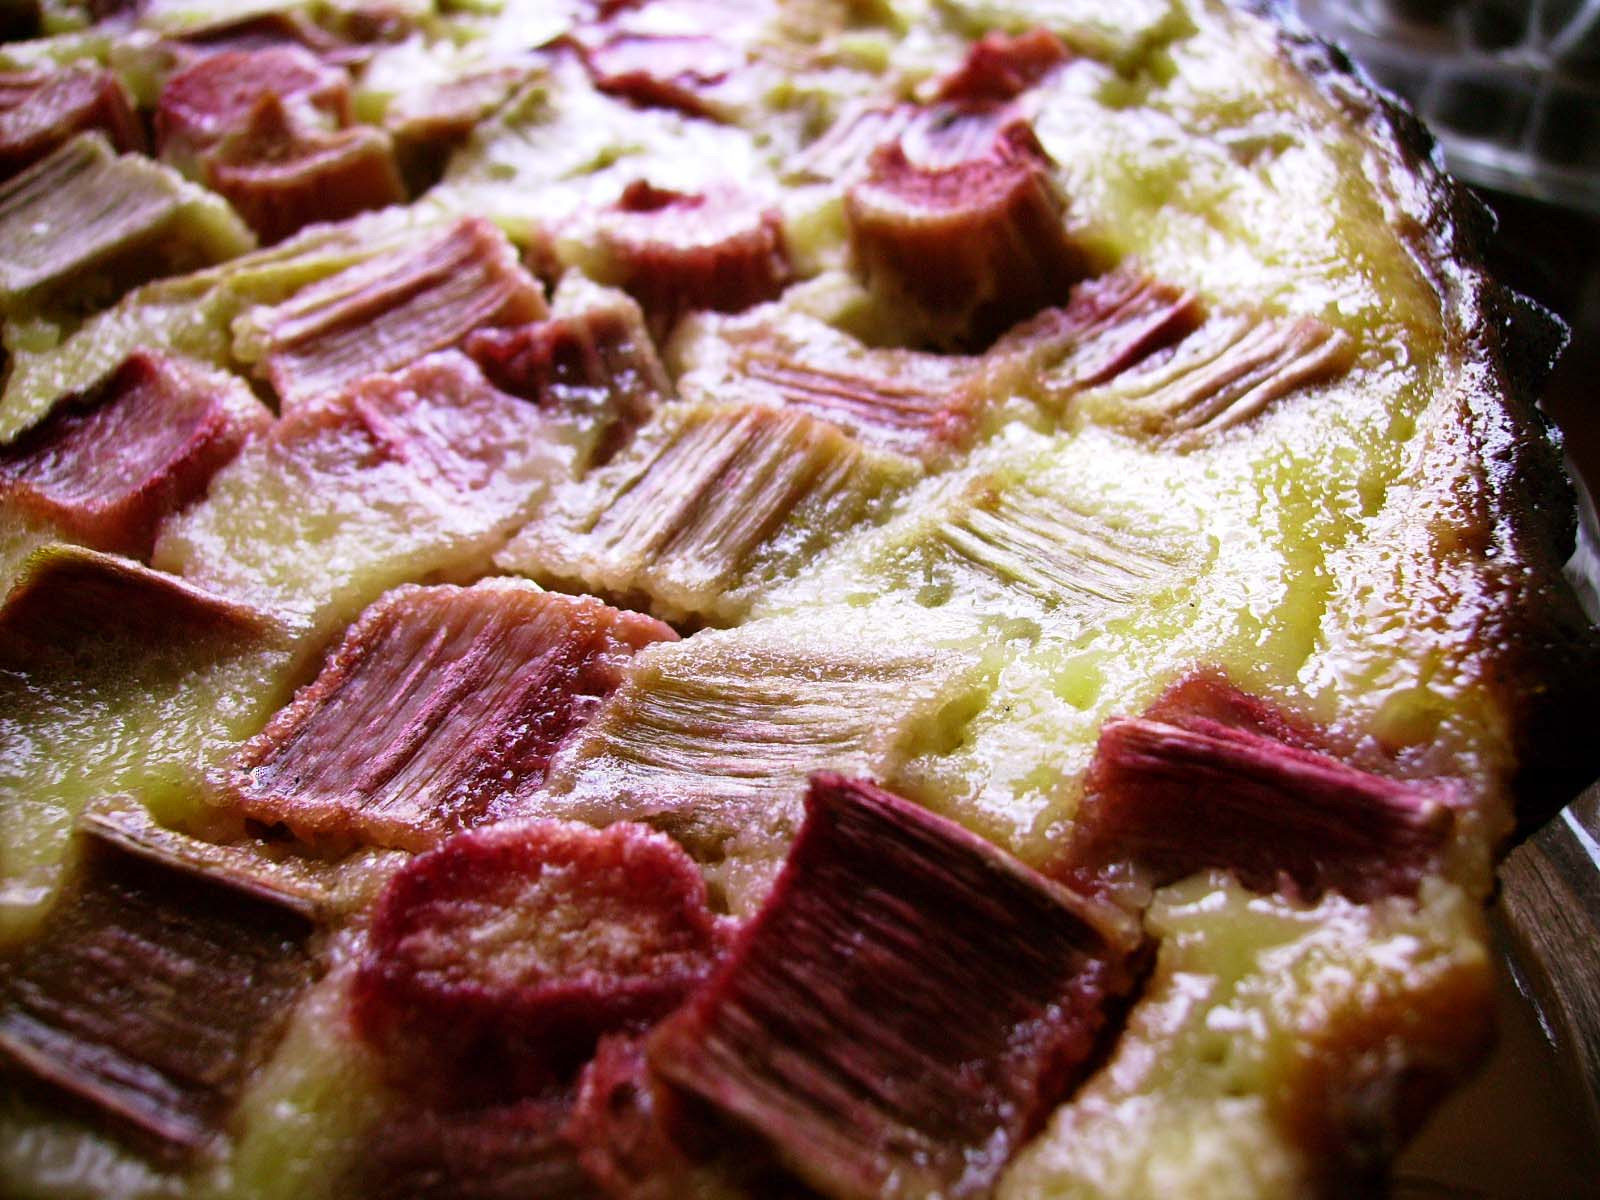 cuisine fran aise recette tarte a la rhubarbe. Black Bedroom Furniture Sets. Home Design Ideas